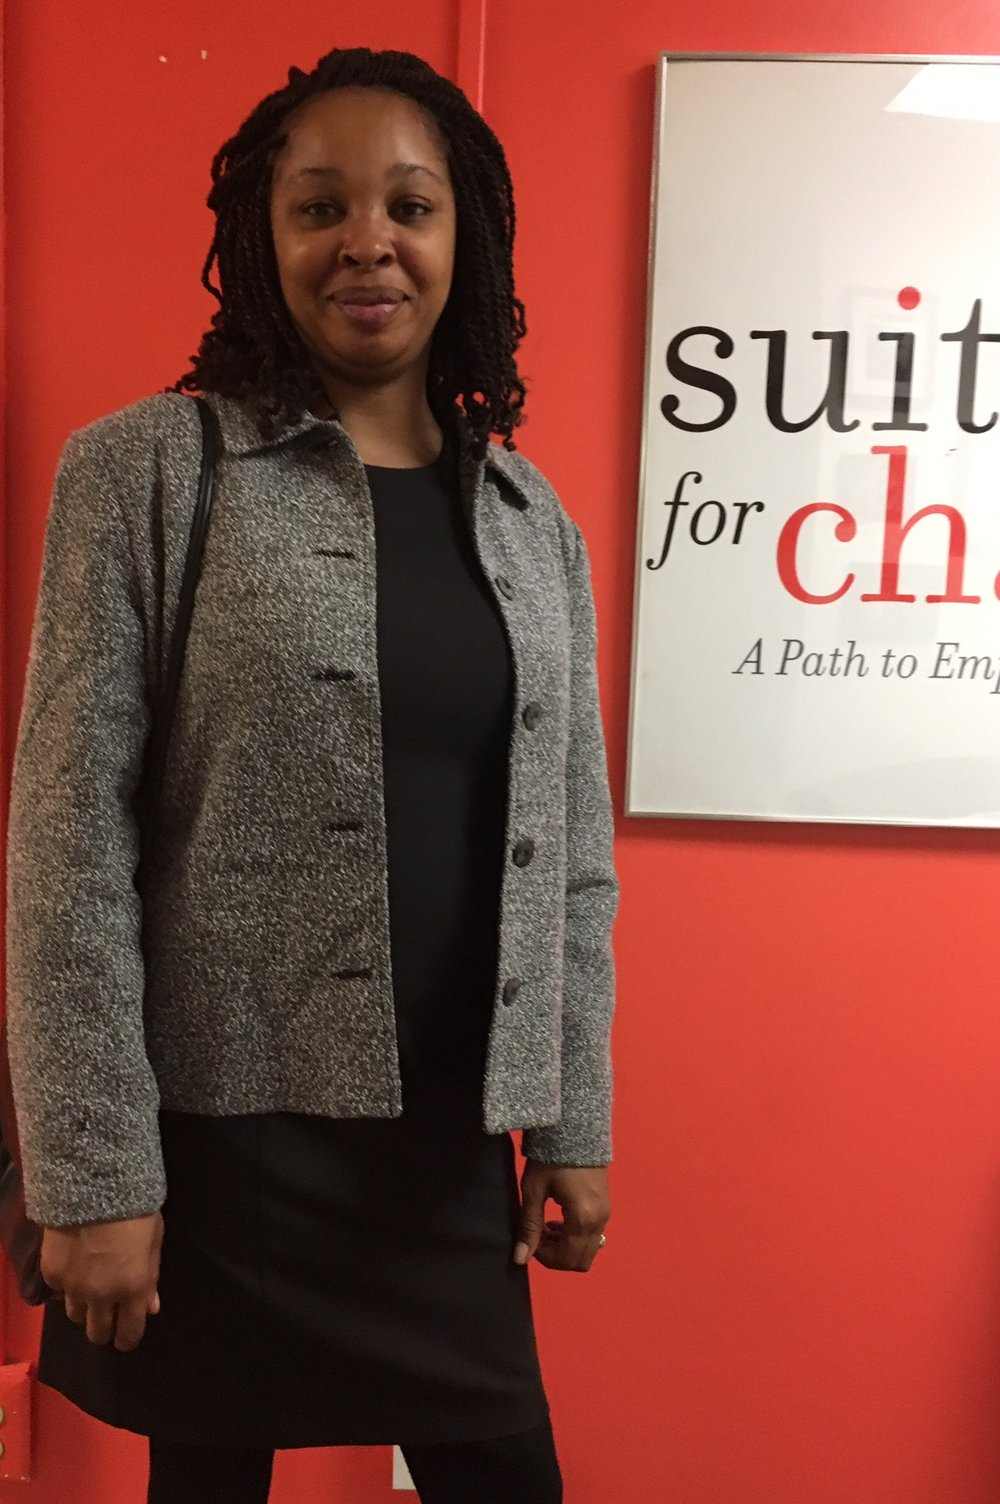 Client at Suited for Change (Washington, D.C.)